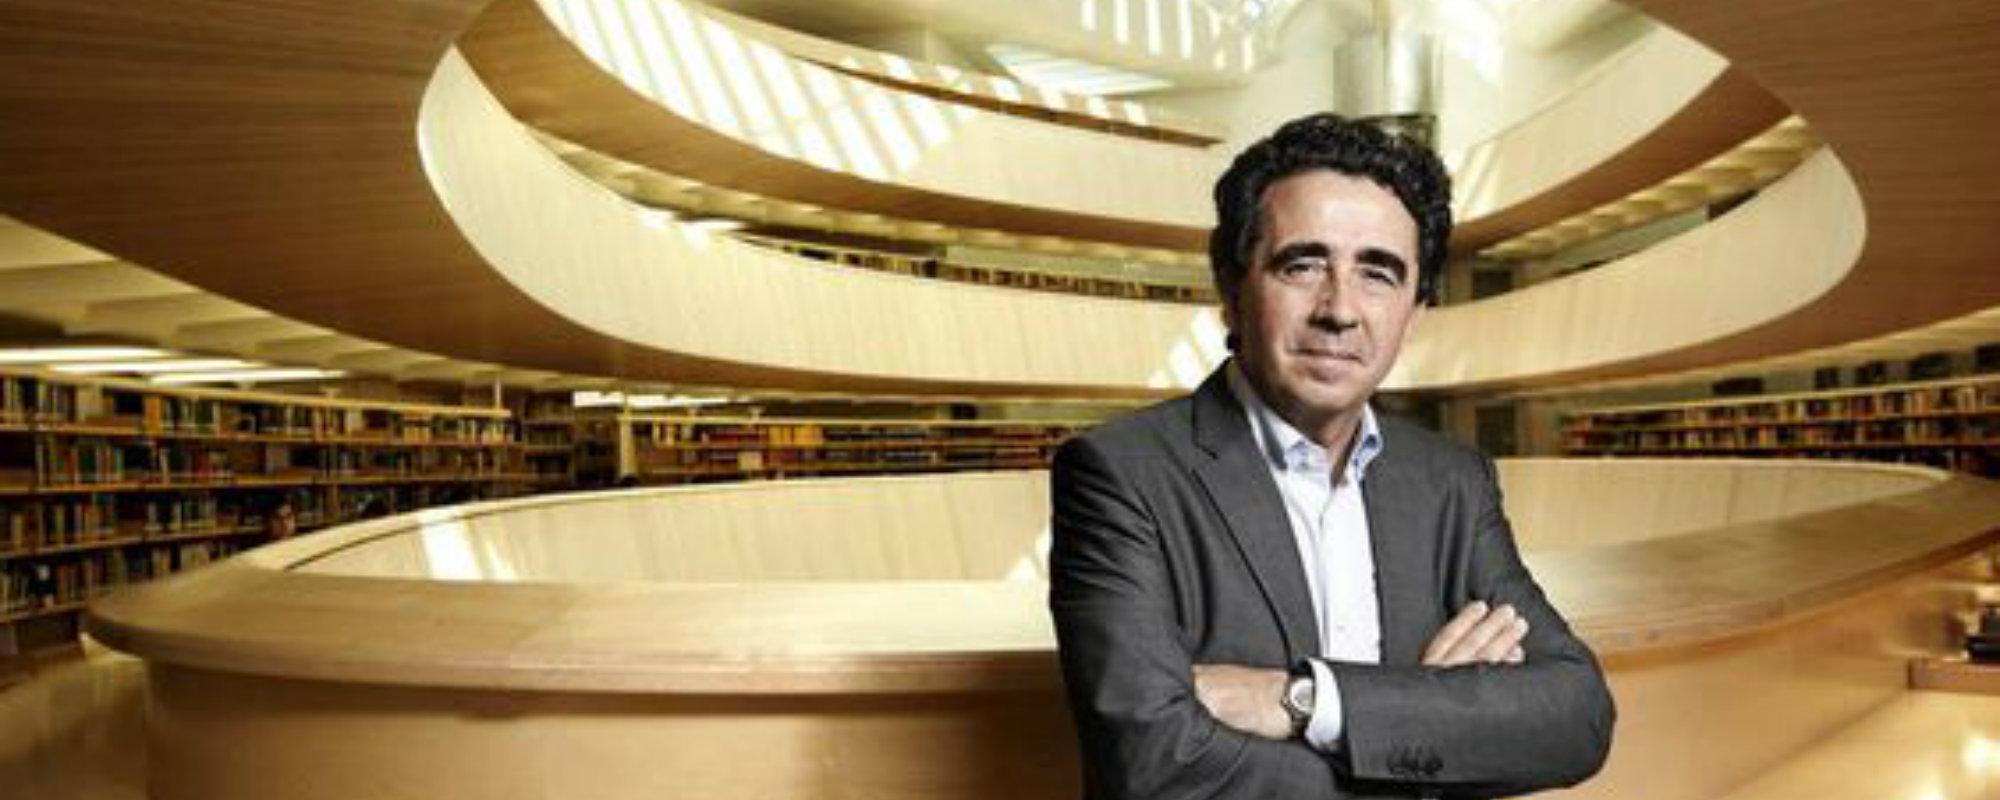 Santiago Calatrava: Un arquitecto fenomenal